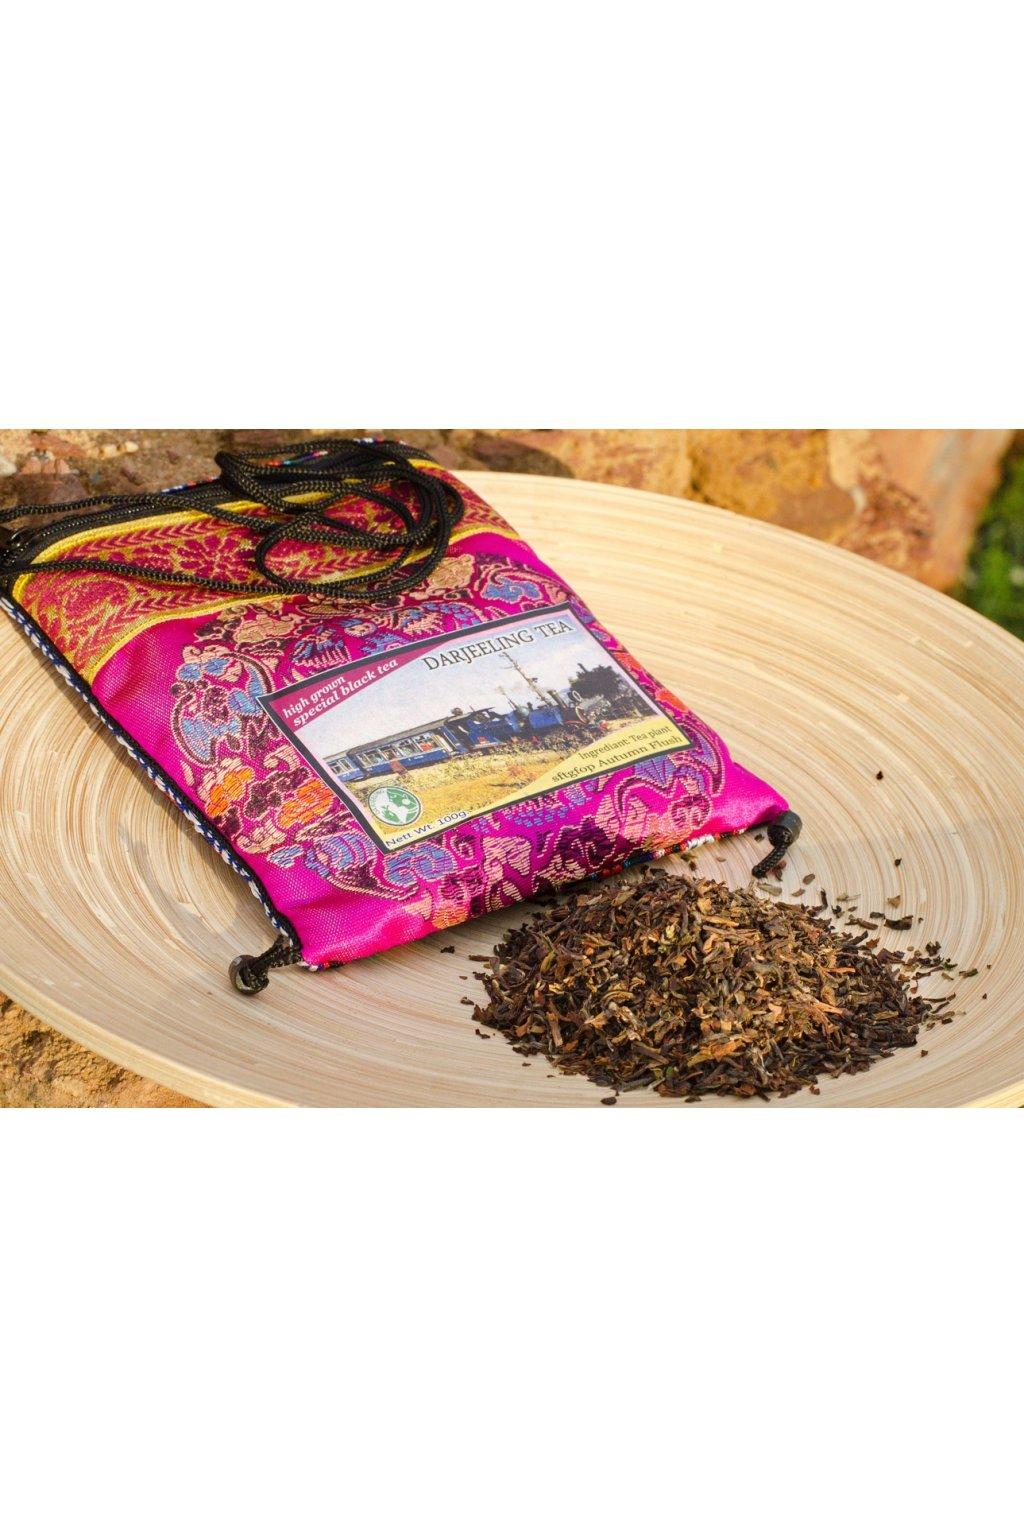 Černý čaj Darjeeling - Autum flush